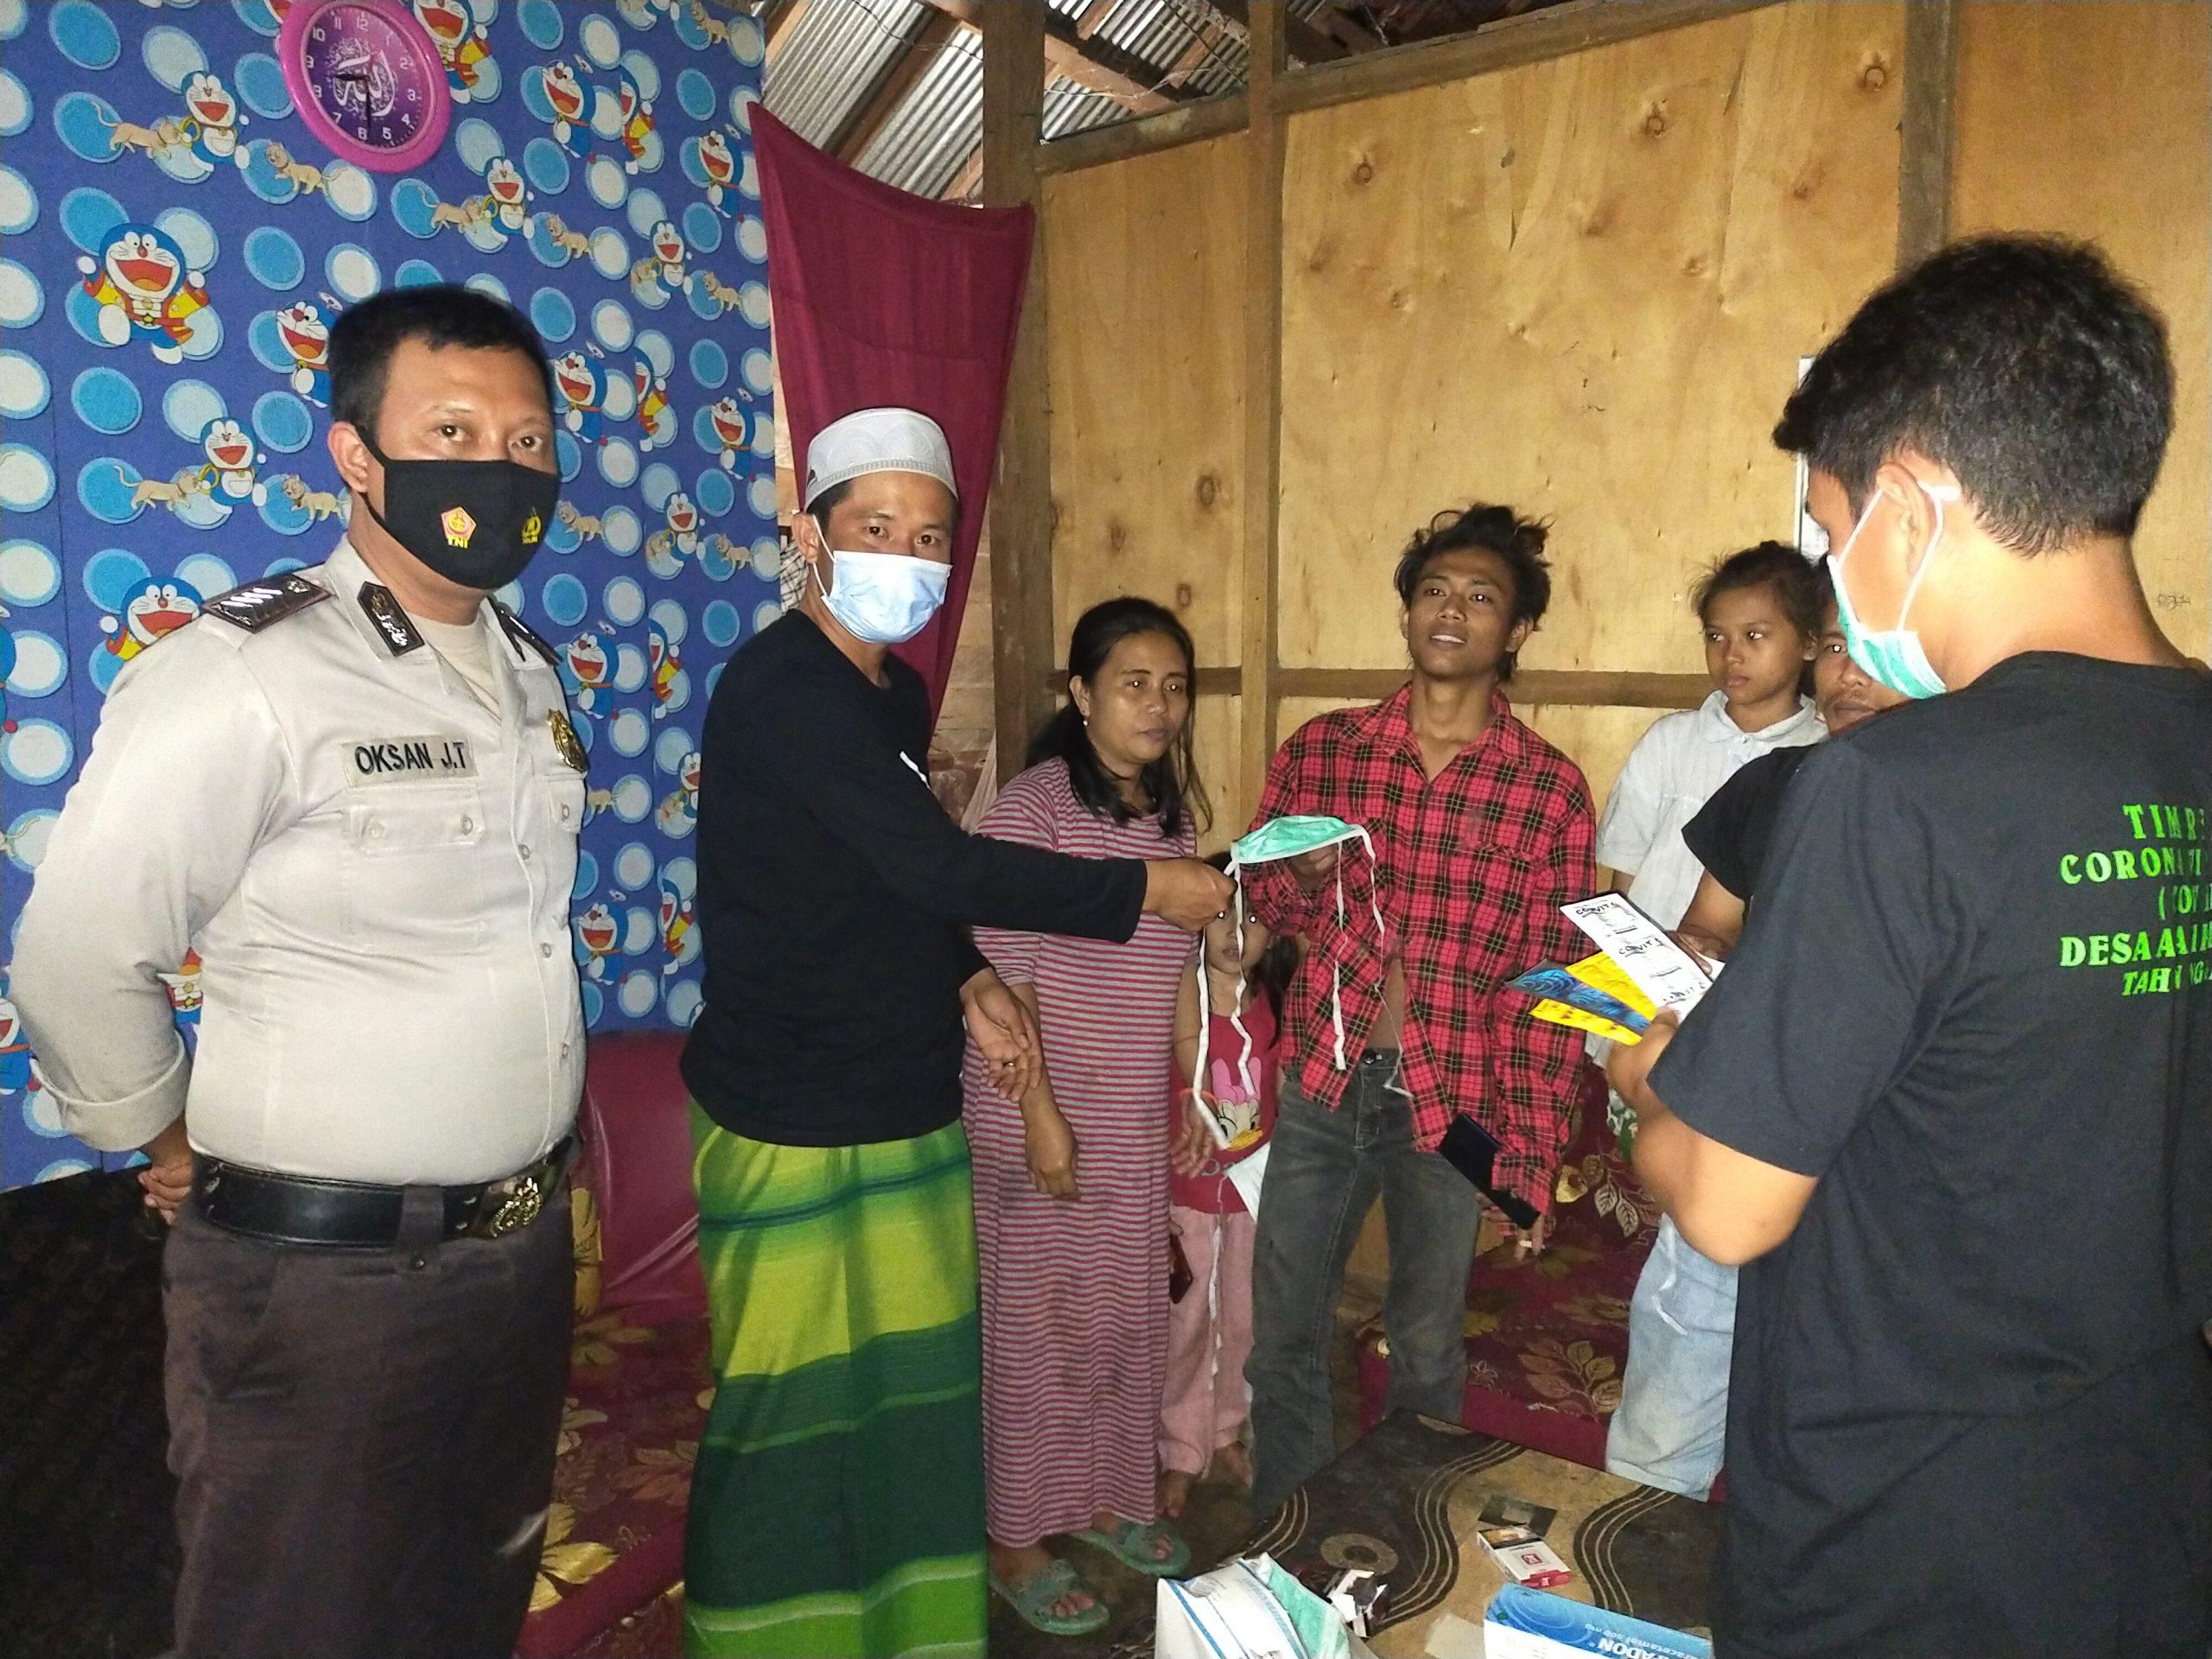 Ketgam : Kepala Desa Asaki Samsul Jaiz saat menyerahkan masker yang di dampingi Bhabinkamtibmas Oksan JT serta tim relawan covid-19.